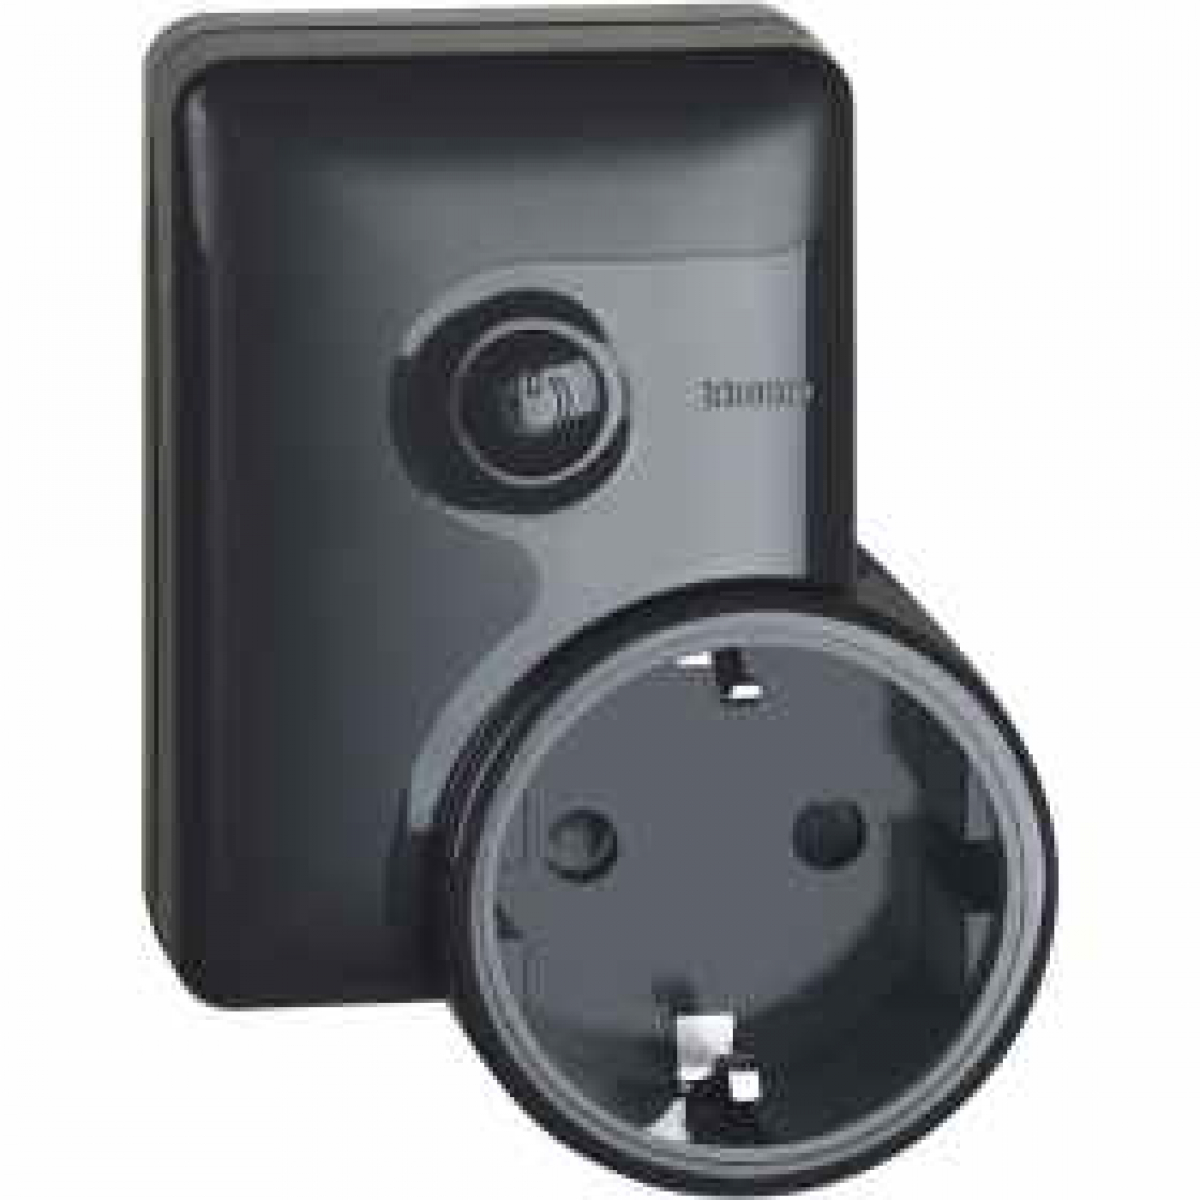 Presa plug&play connessa Bticino 4141PC